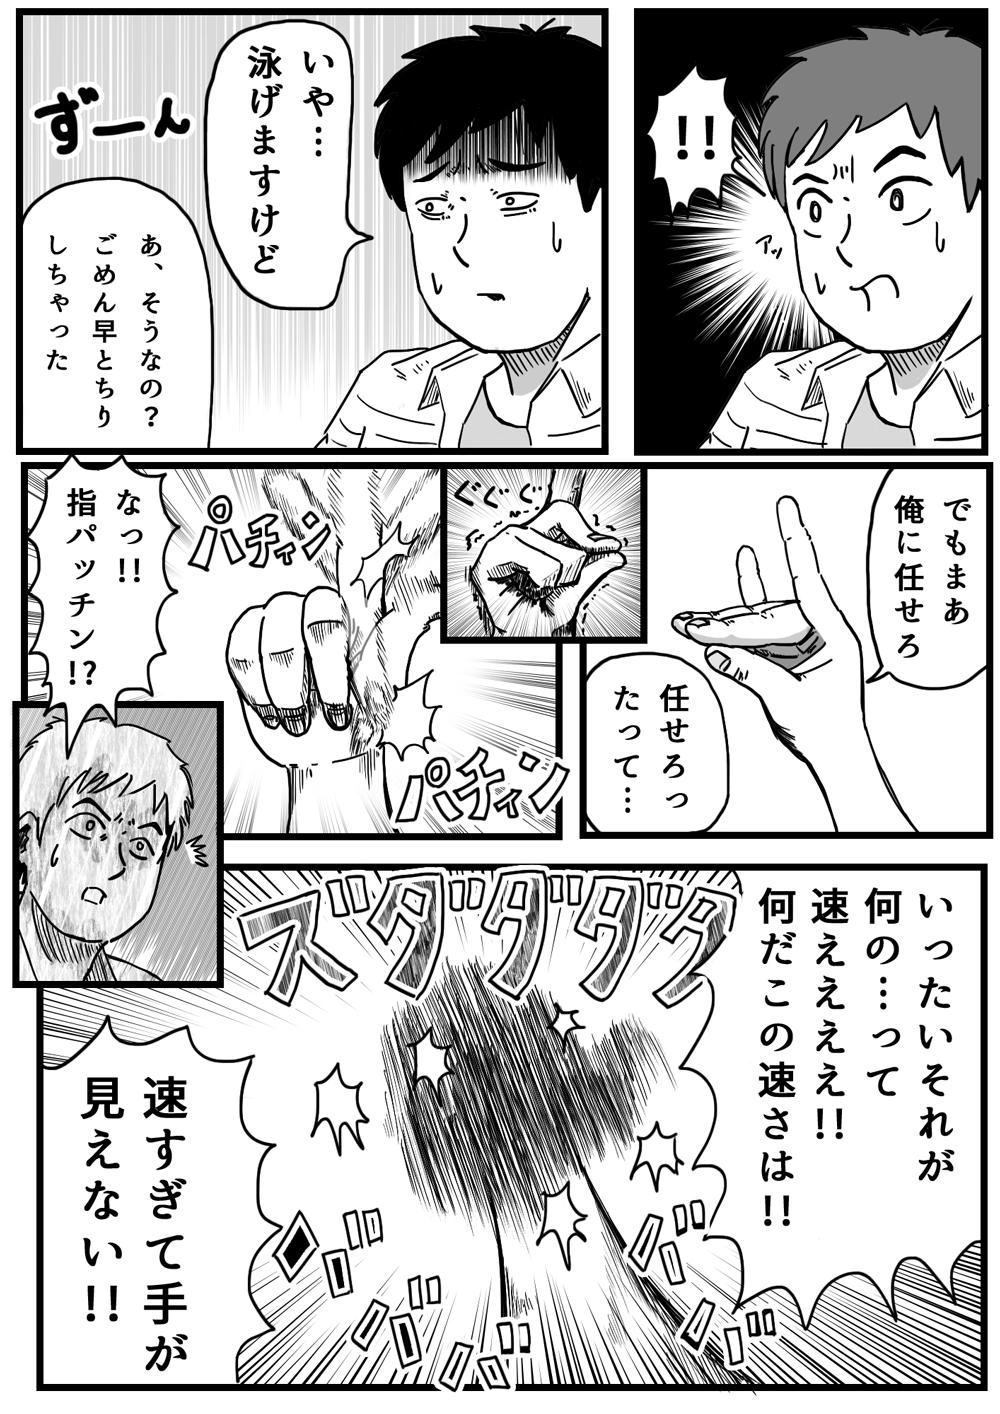 arnolds-hasegawa-002-3